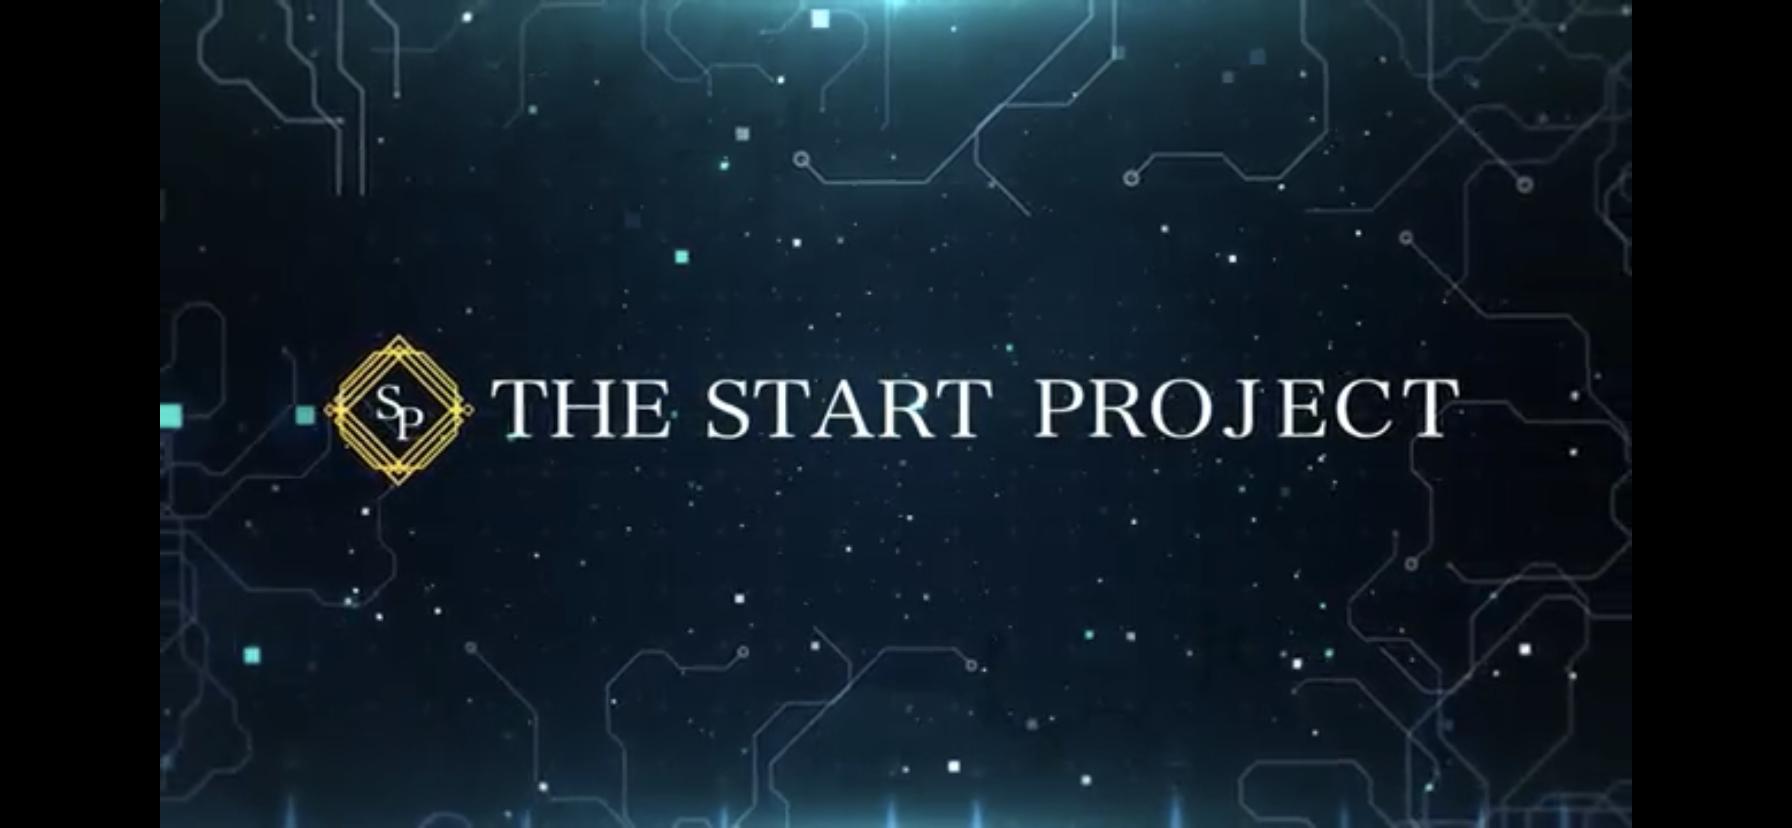 THE START PROJECTは本当に稼げる?詐欺?渡秀明(HIDE)の実績や評判